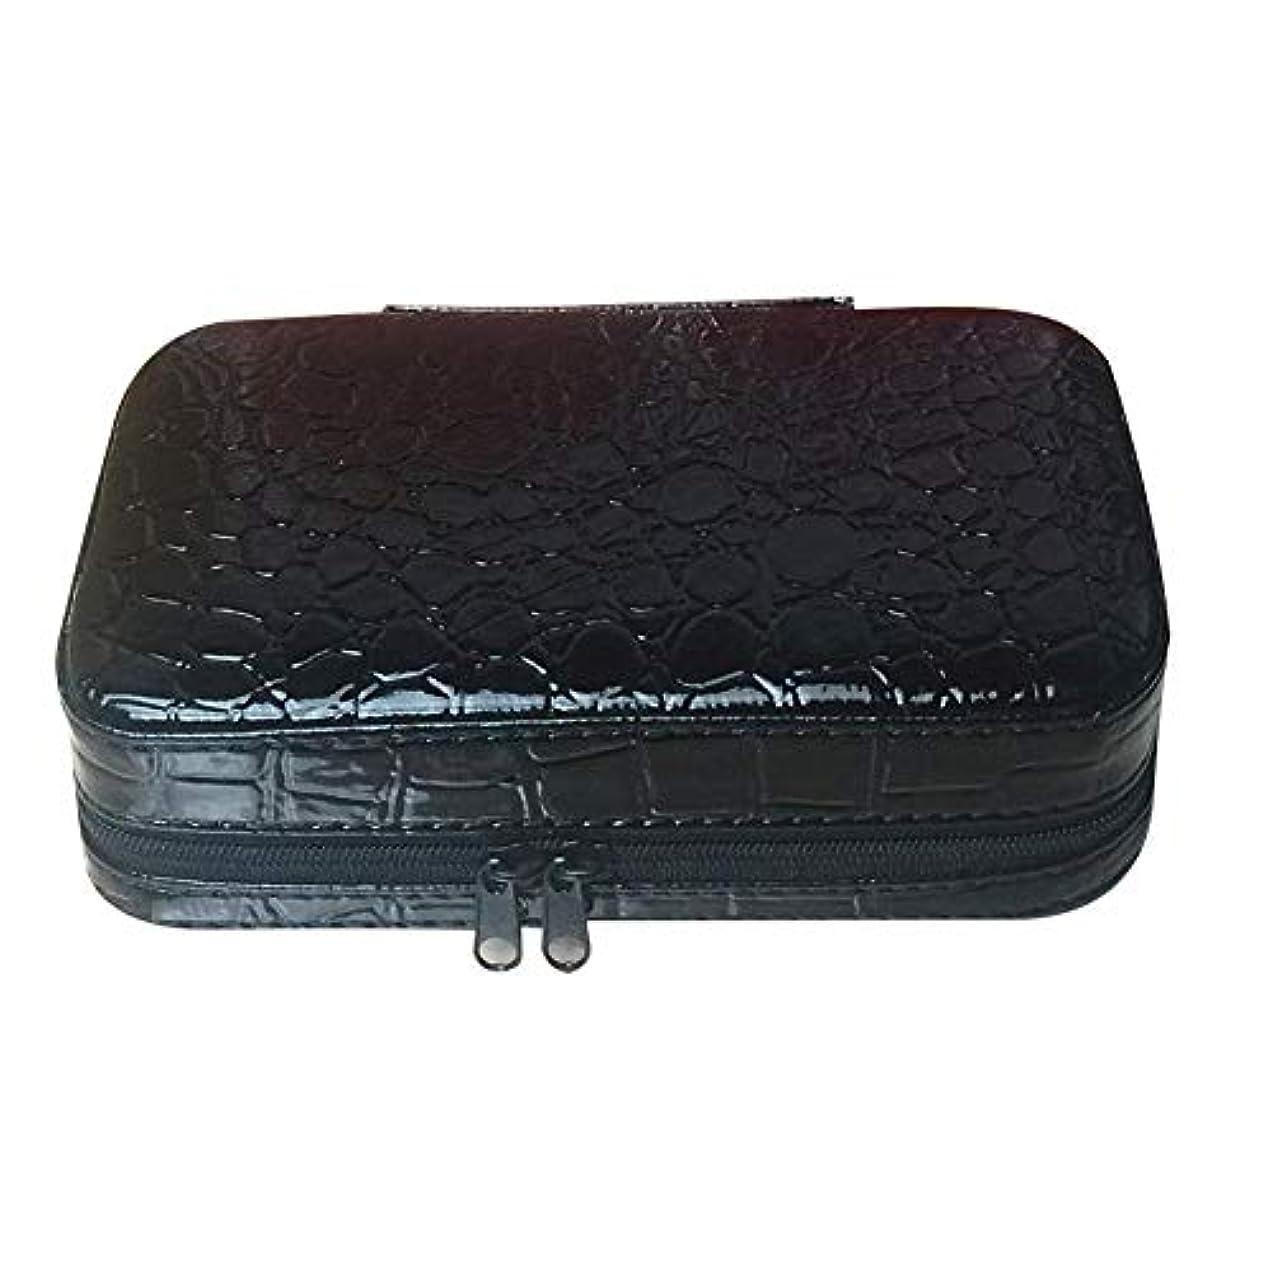 Newfashion アロマポーチ エッセンシャルオイル収納ケース アロマオイル収納ボックス 香水収納ポーチ 化粧ポーチ 耐震 大容量 携帯便利 32本用